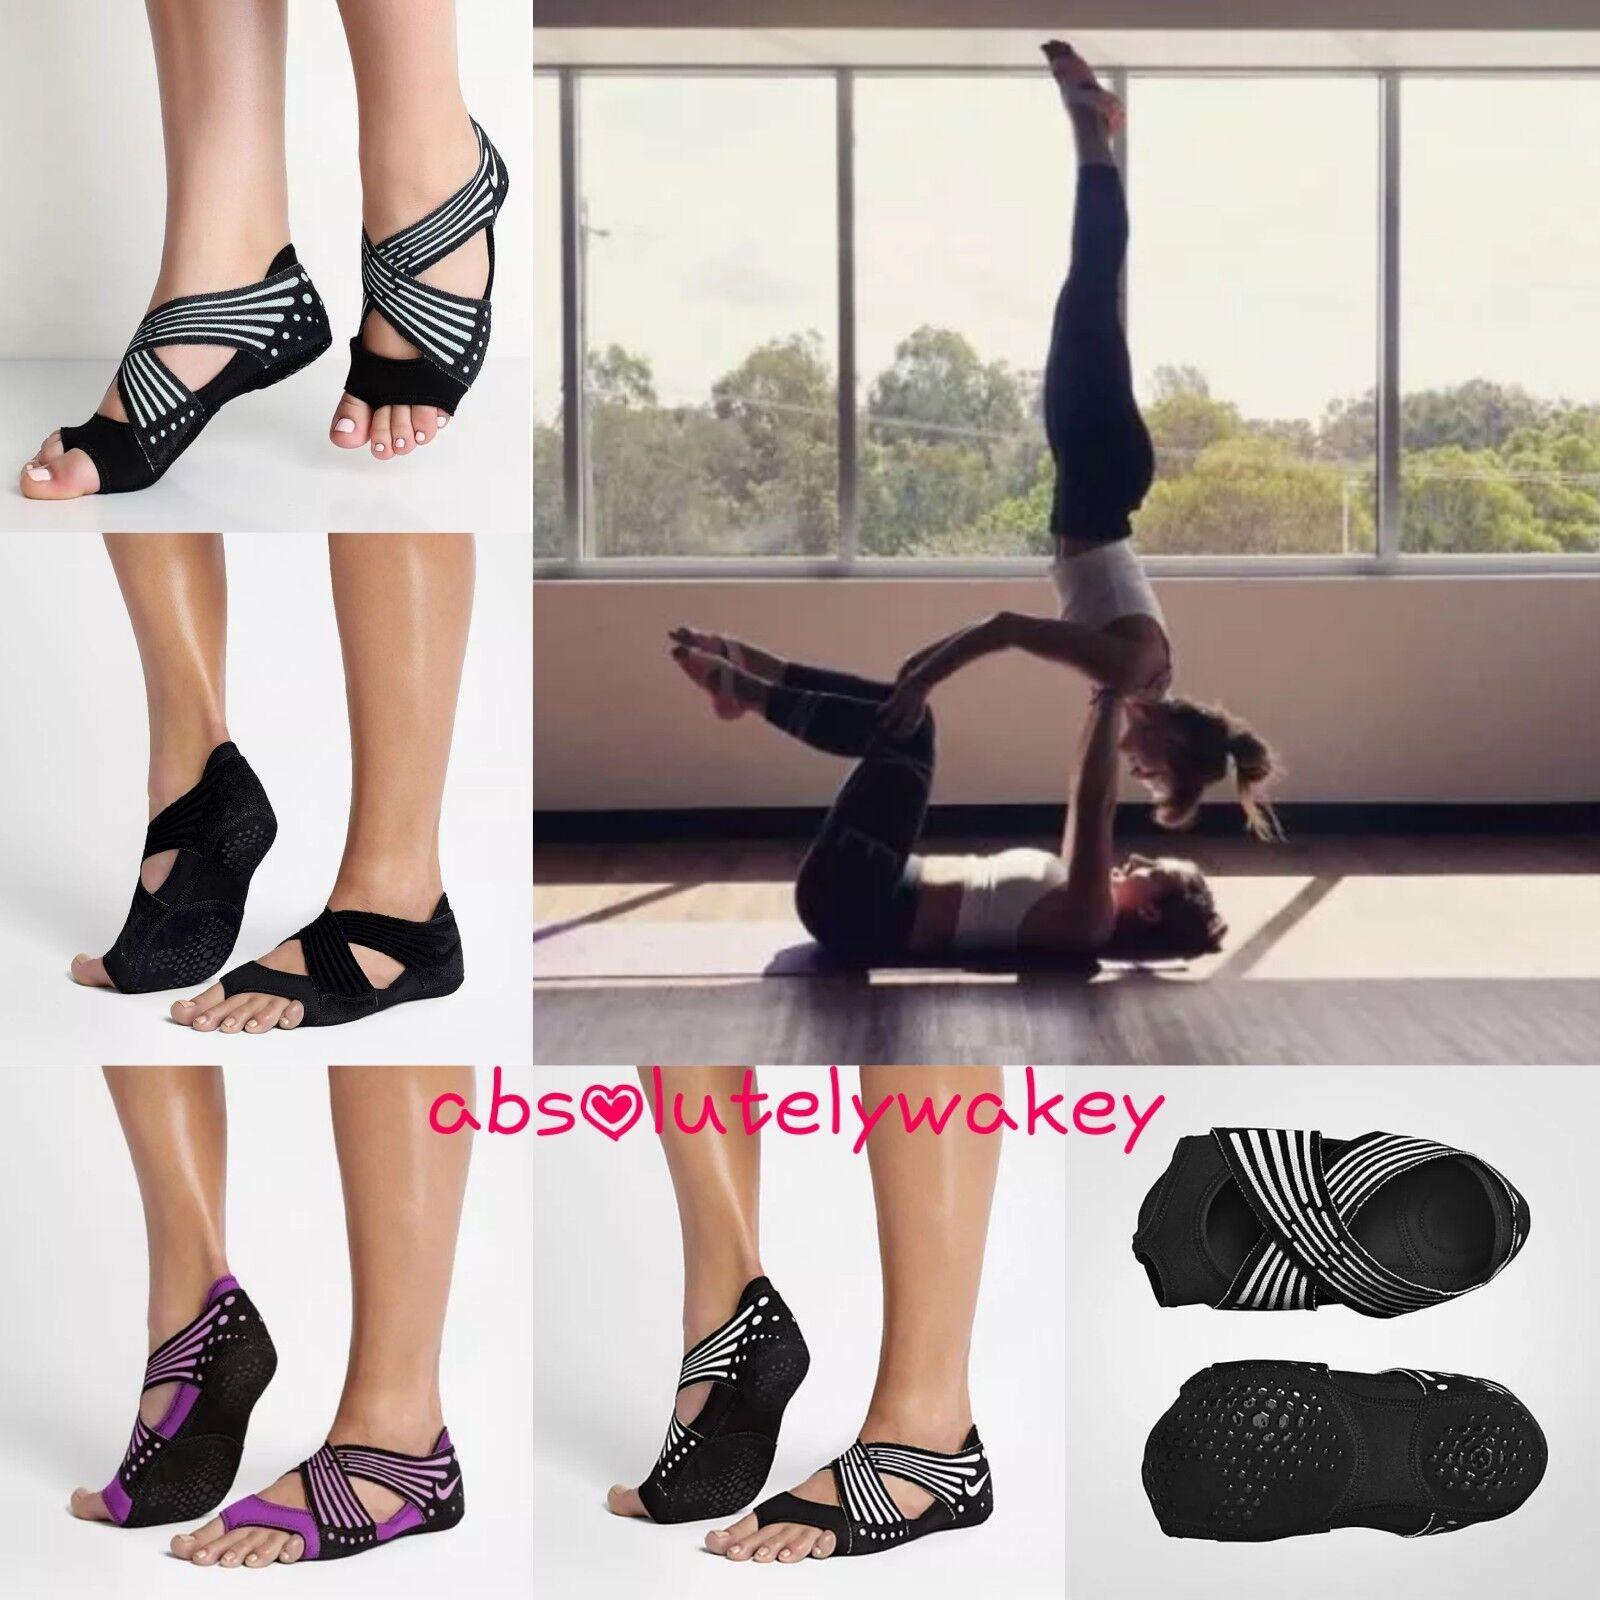 NIKE Women's Studio Wrap 4 Dance Yoga Stripe Barre Pilates Training Barefoot